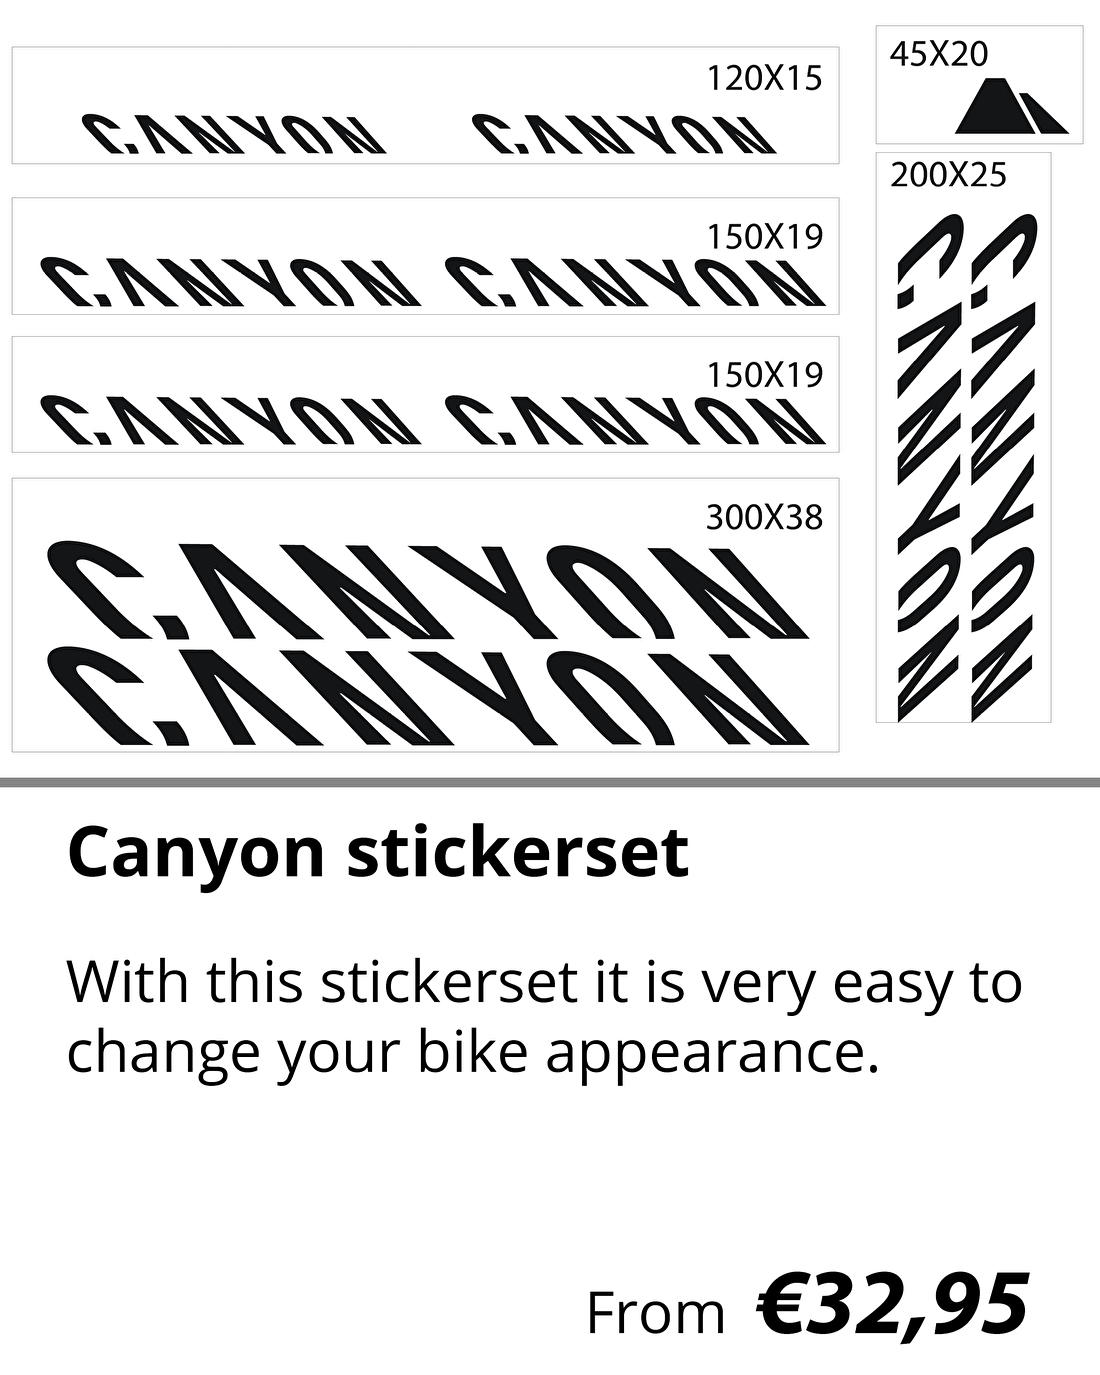 https://www.unlimitedwebshop.nl/en_GB/a-44861425/canyon/canyon-stickers/#description